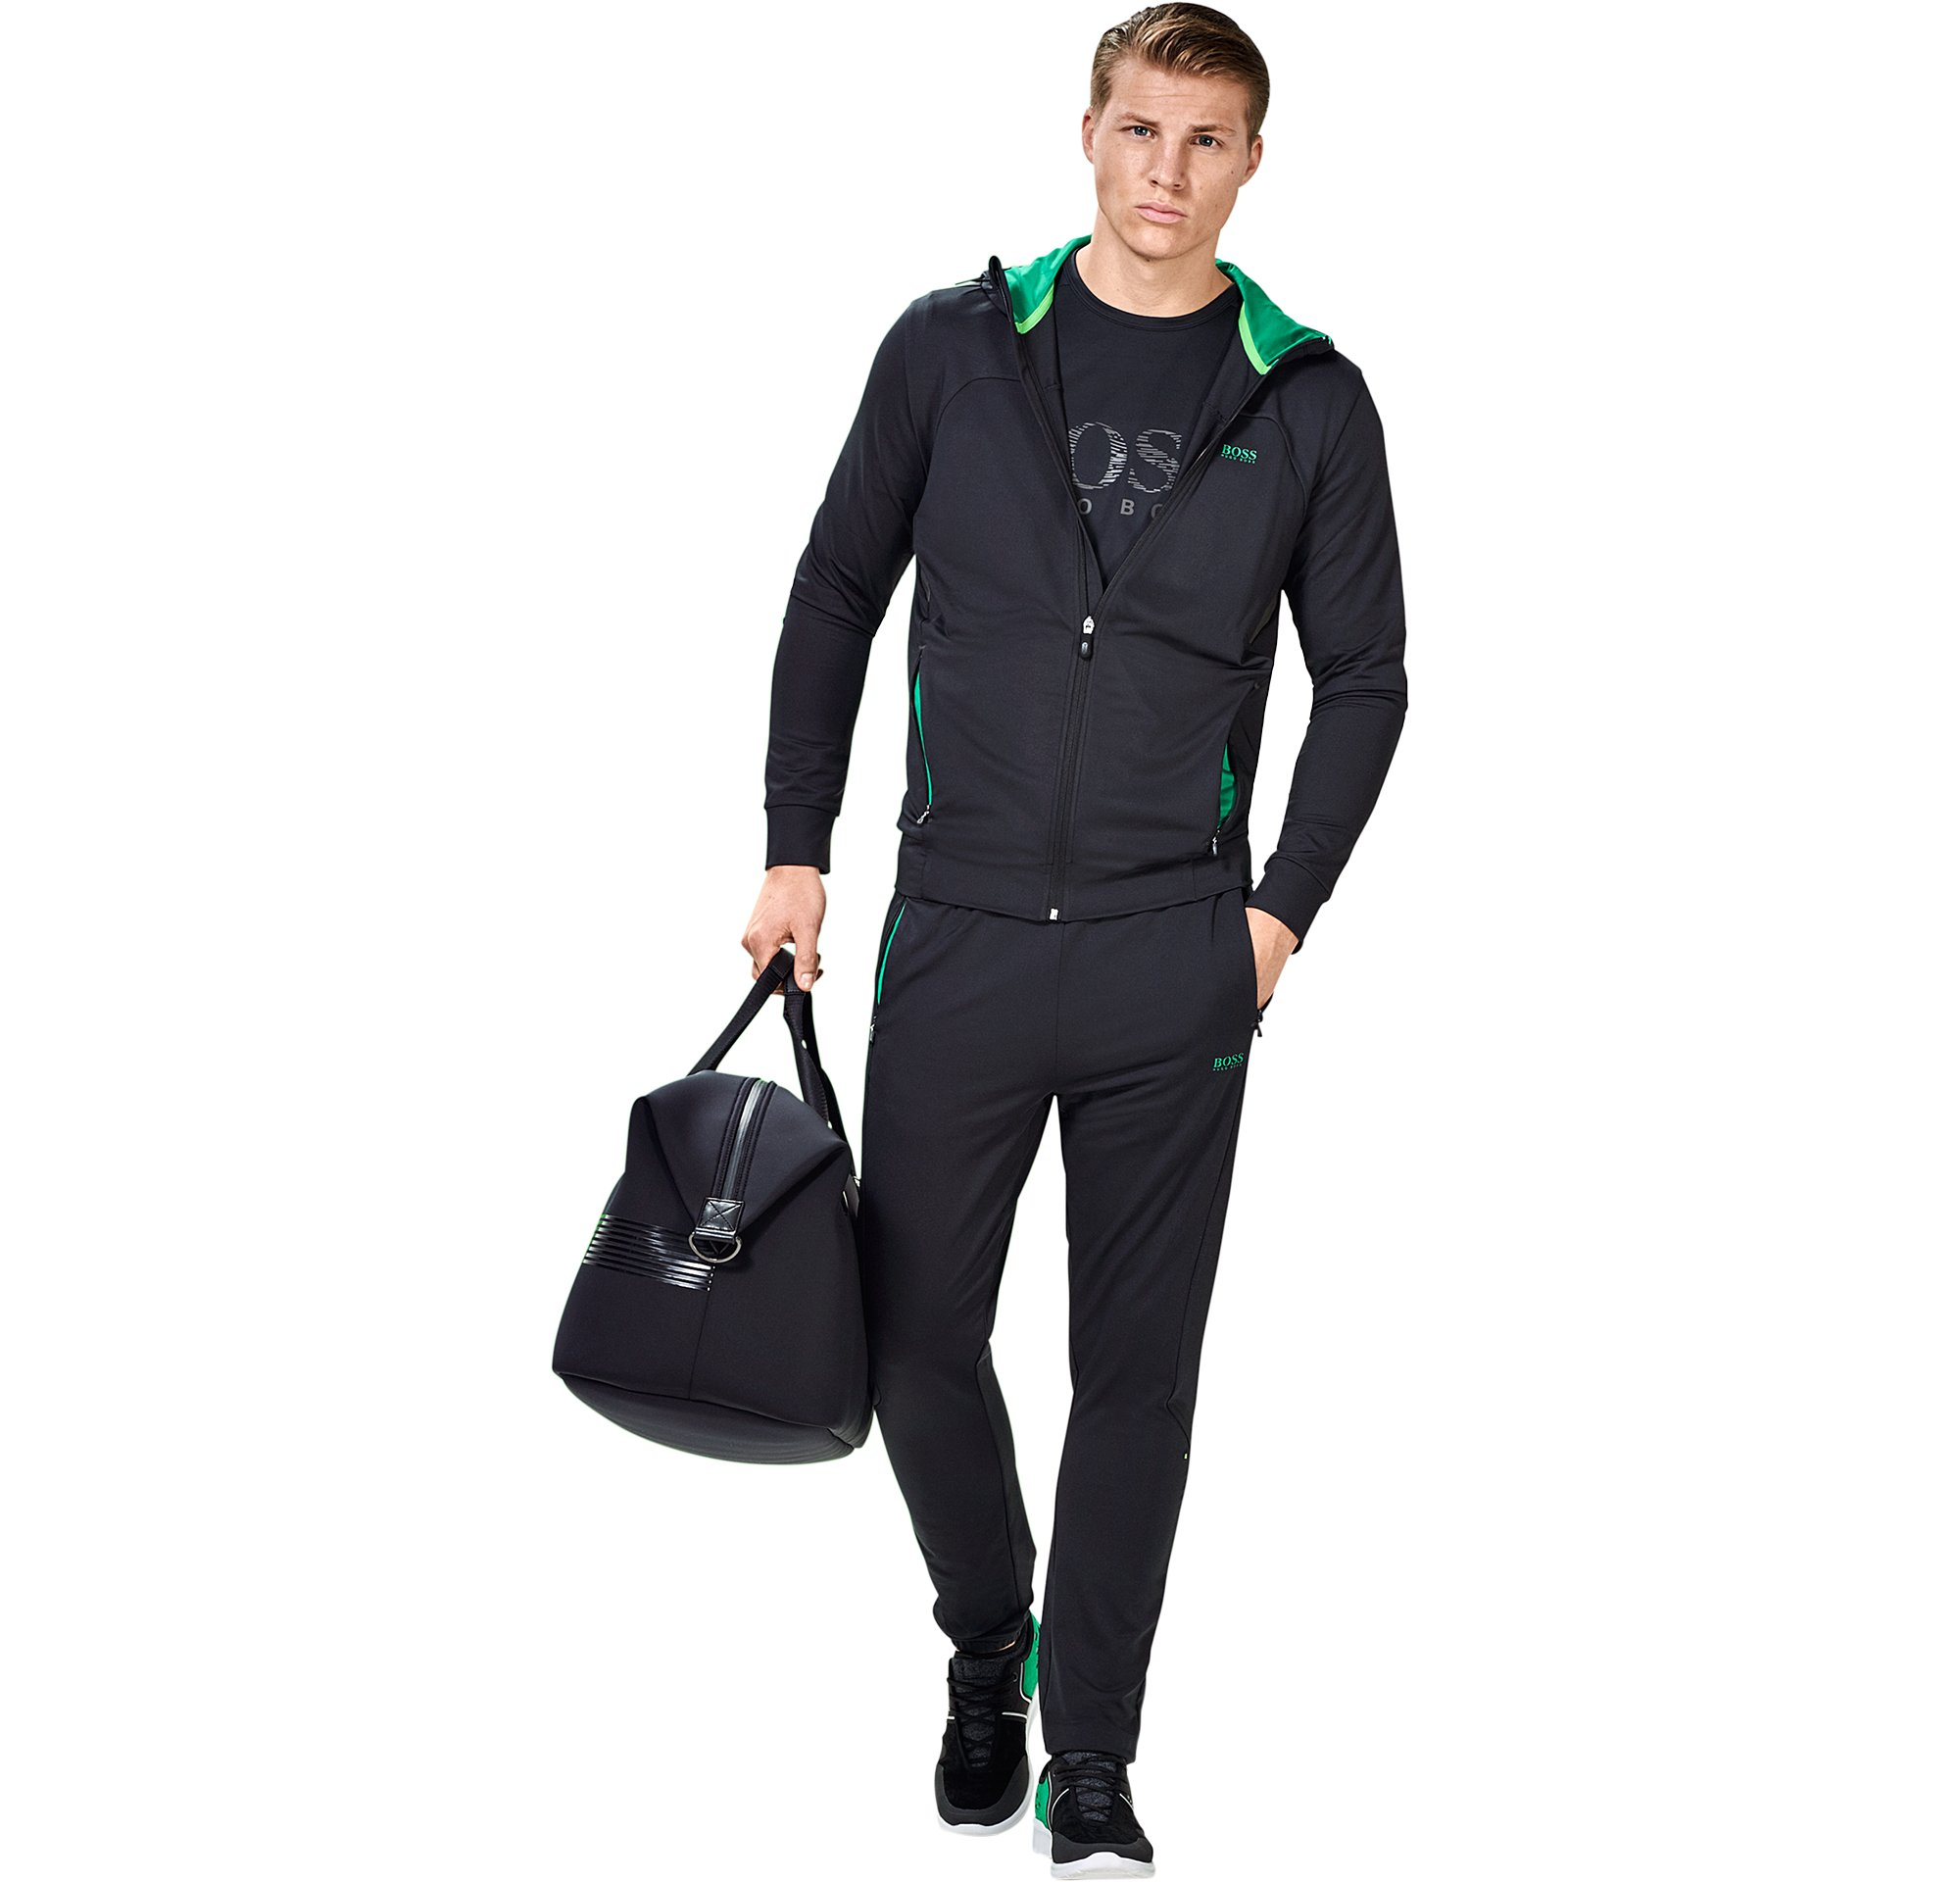 Chemise, pantalon BOSS Green